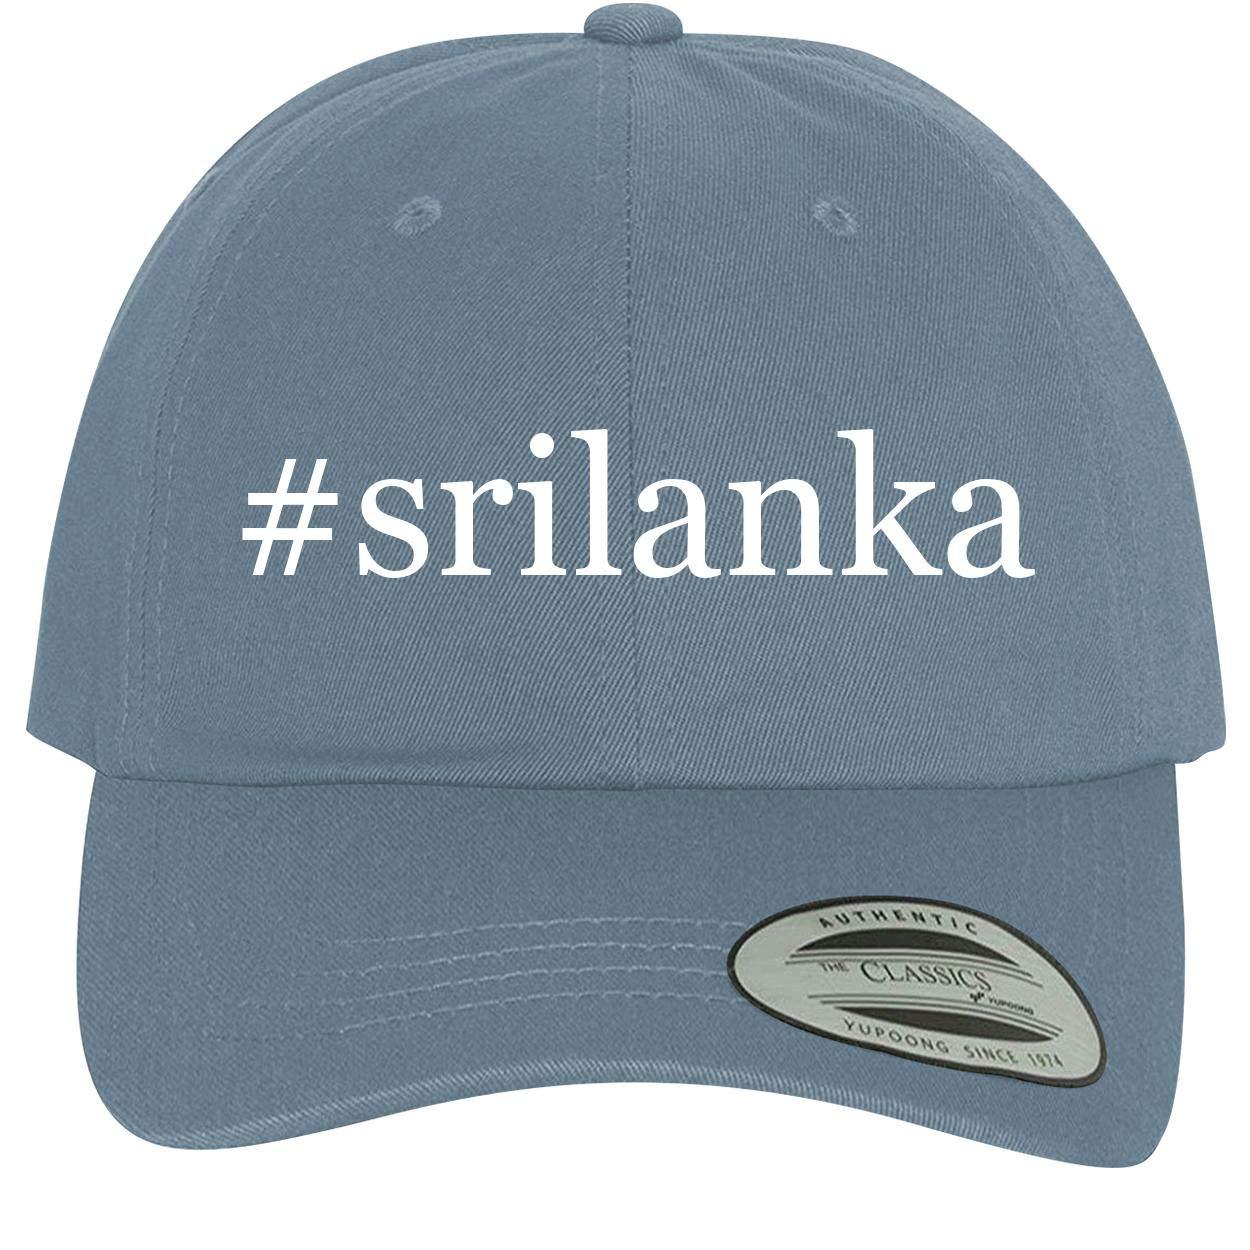 BH Cool Designs #Srilanka Comfortable Dad Hat Baseball Cap